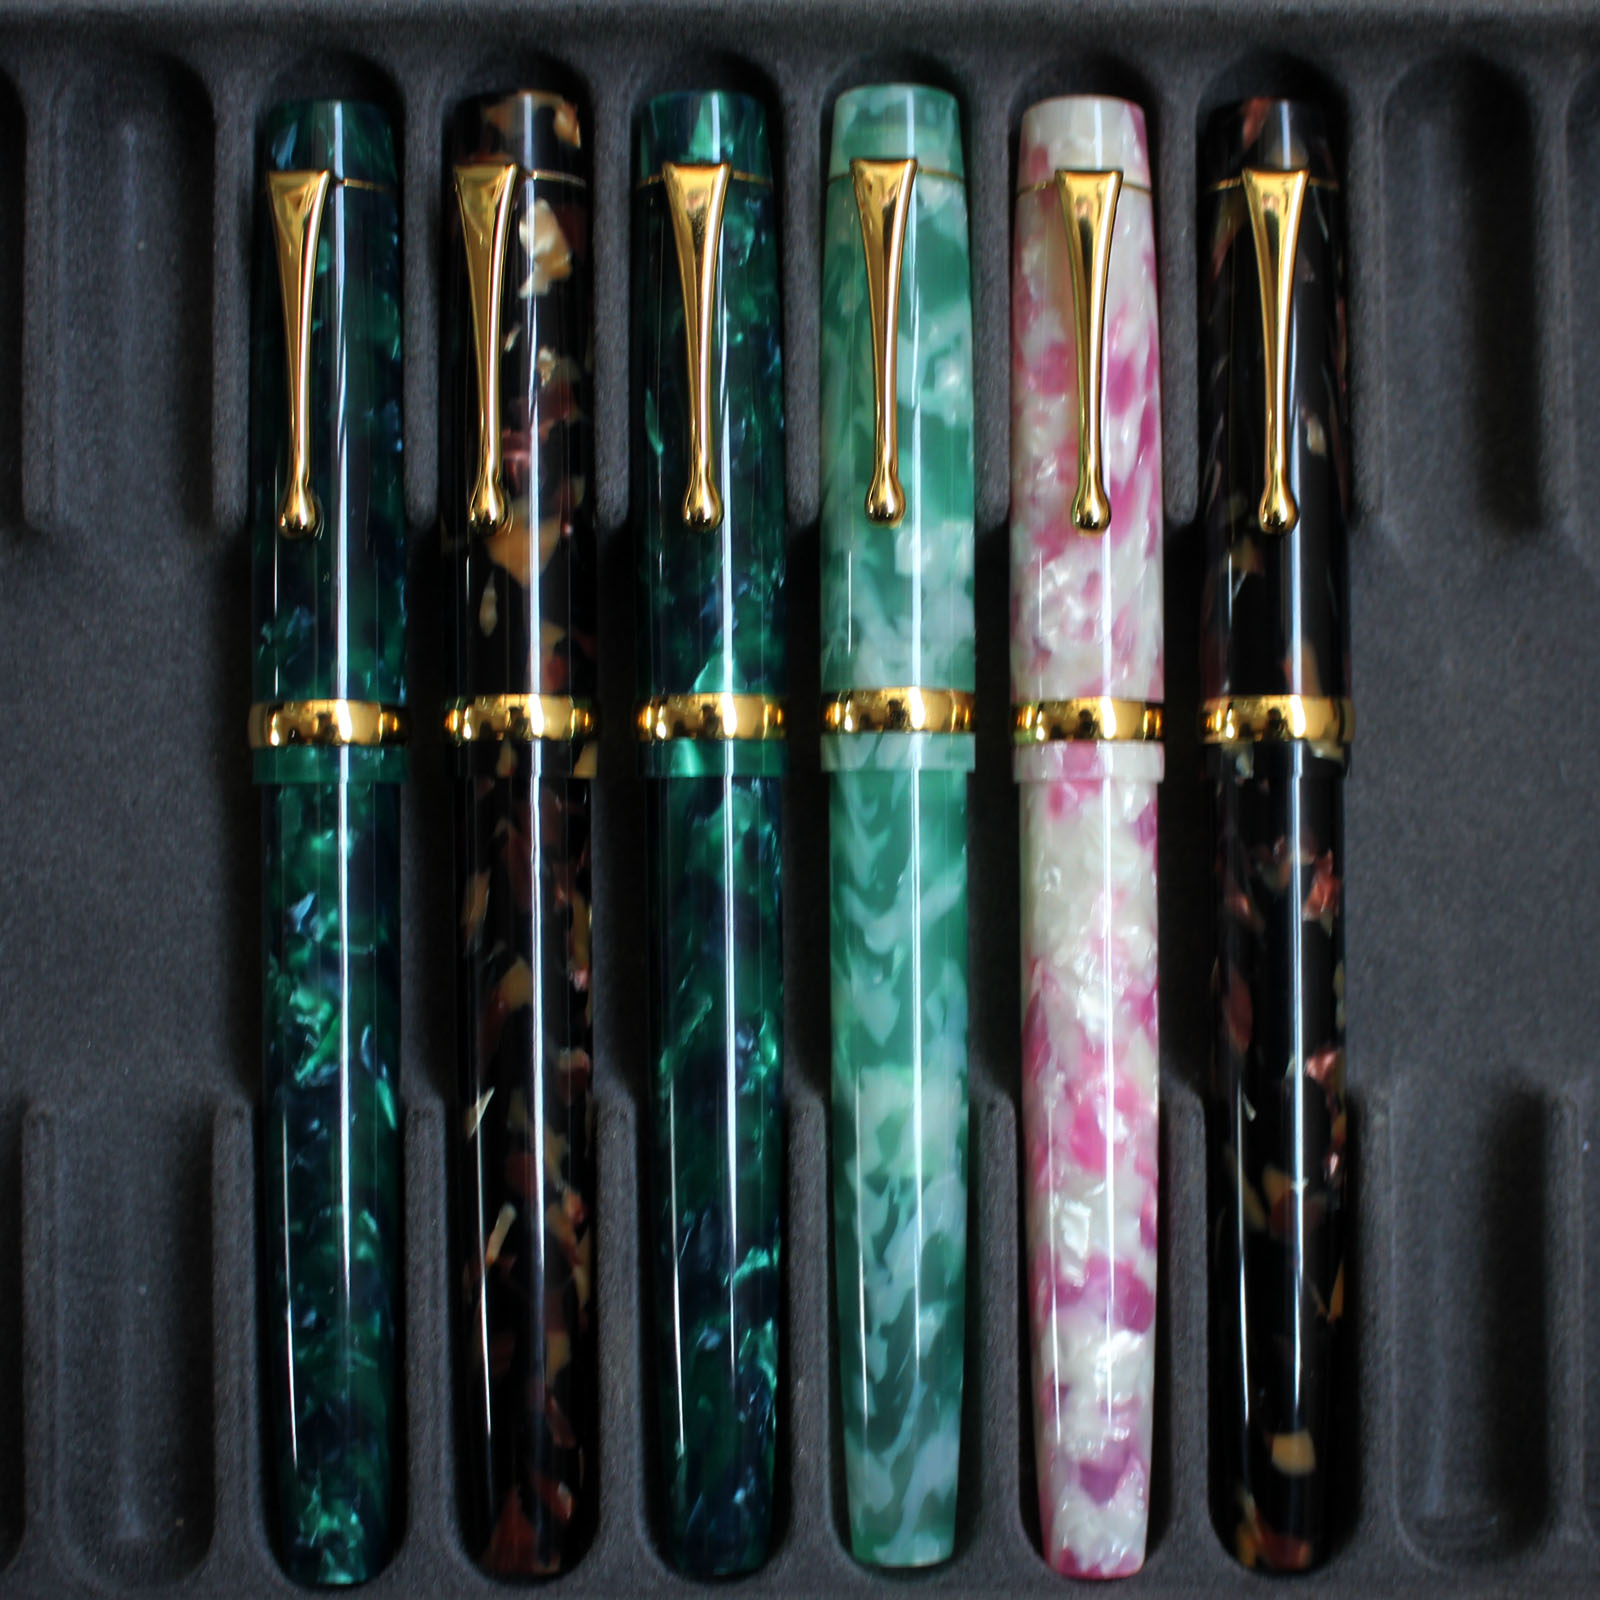 OEM Resin Fountain Pen Beauiful Ink Pen Converter Filler Fine Nib Business Stationery Office School Supplies Writing Gift